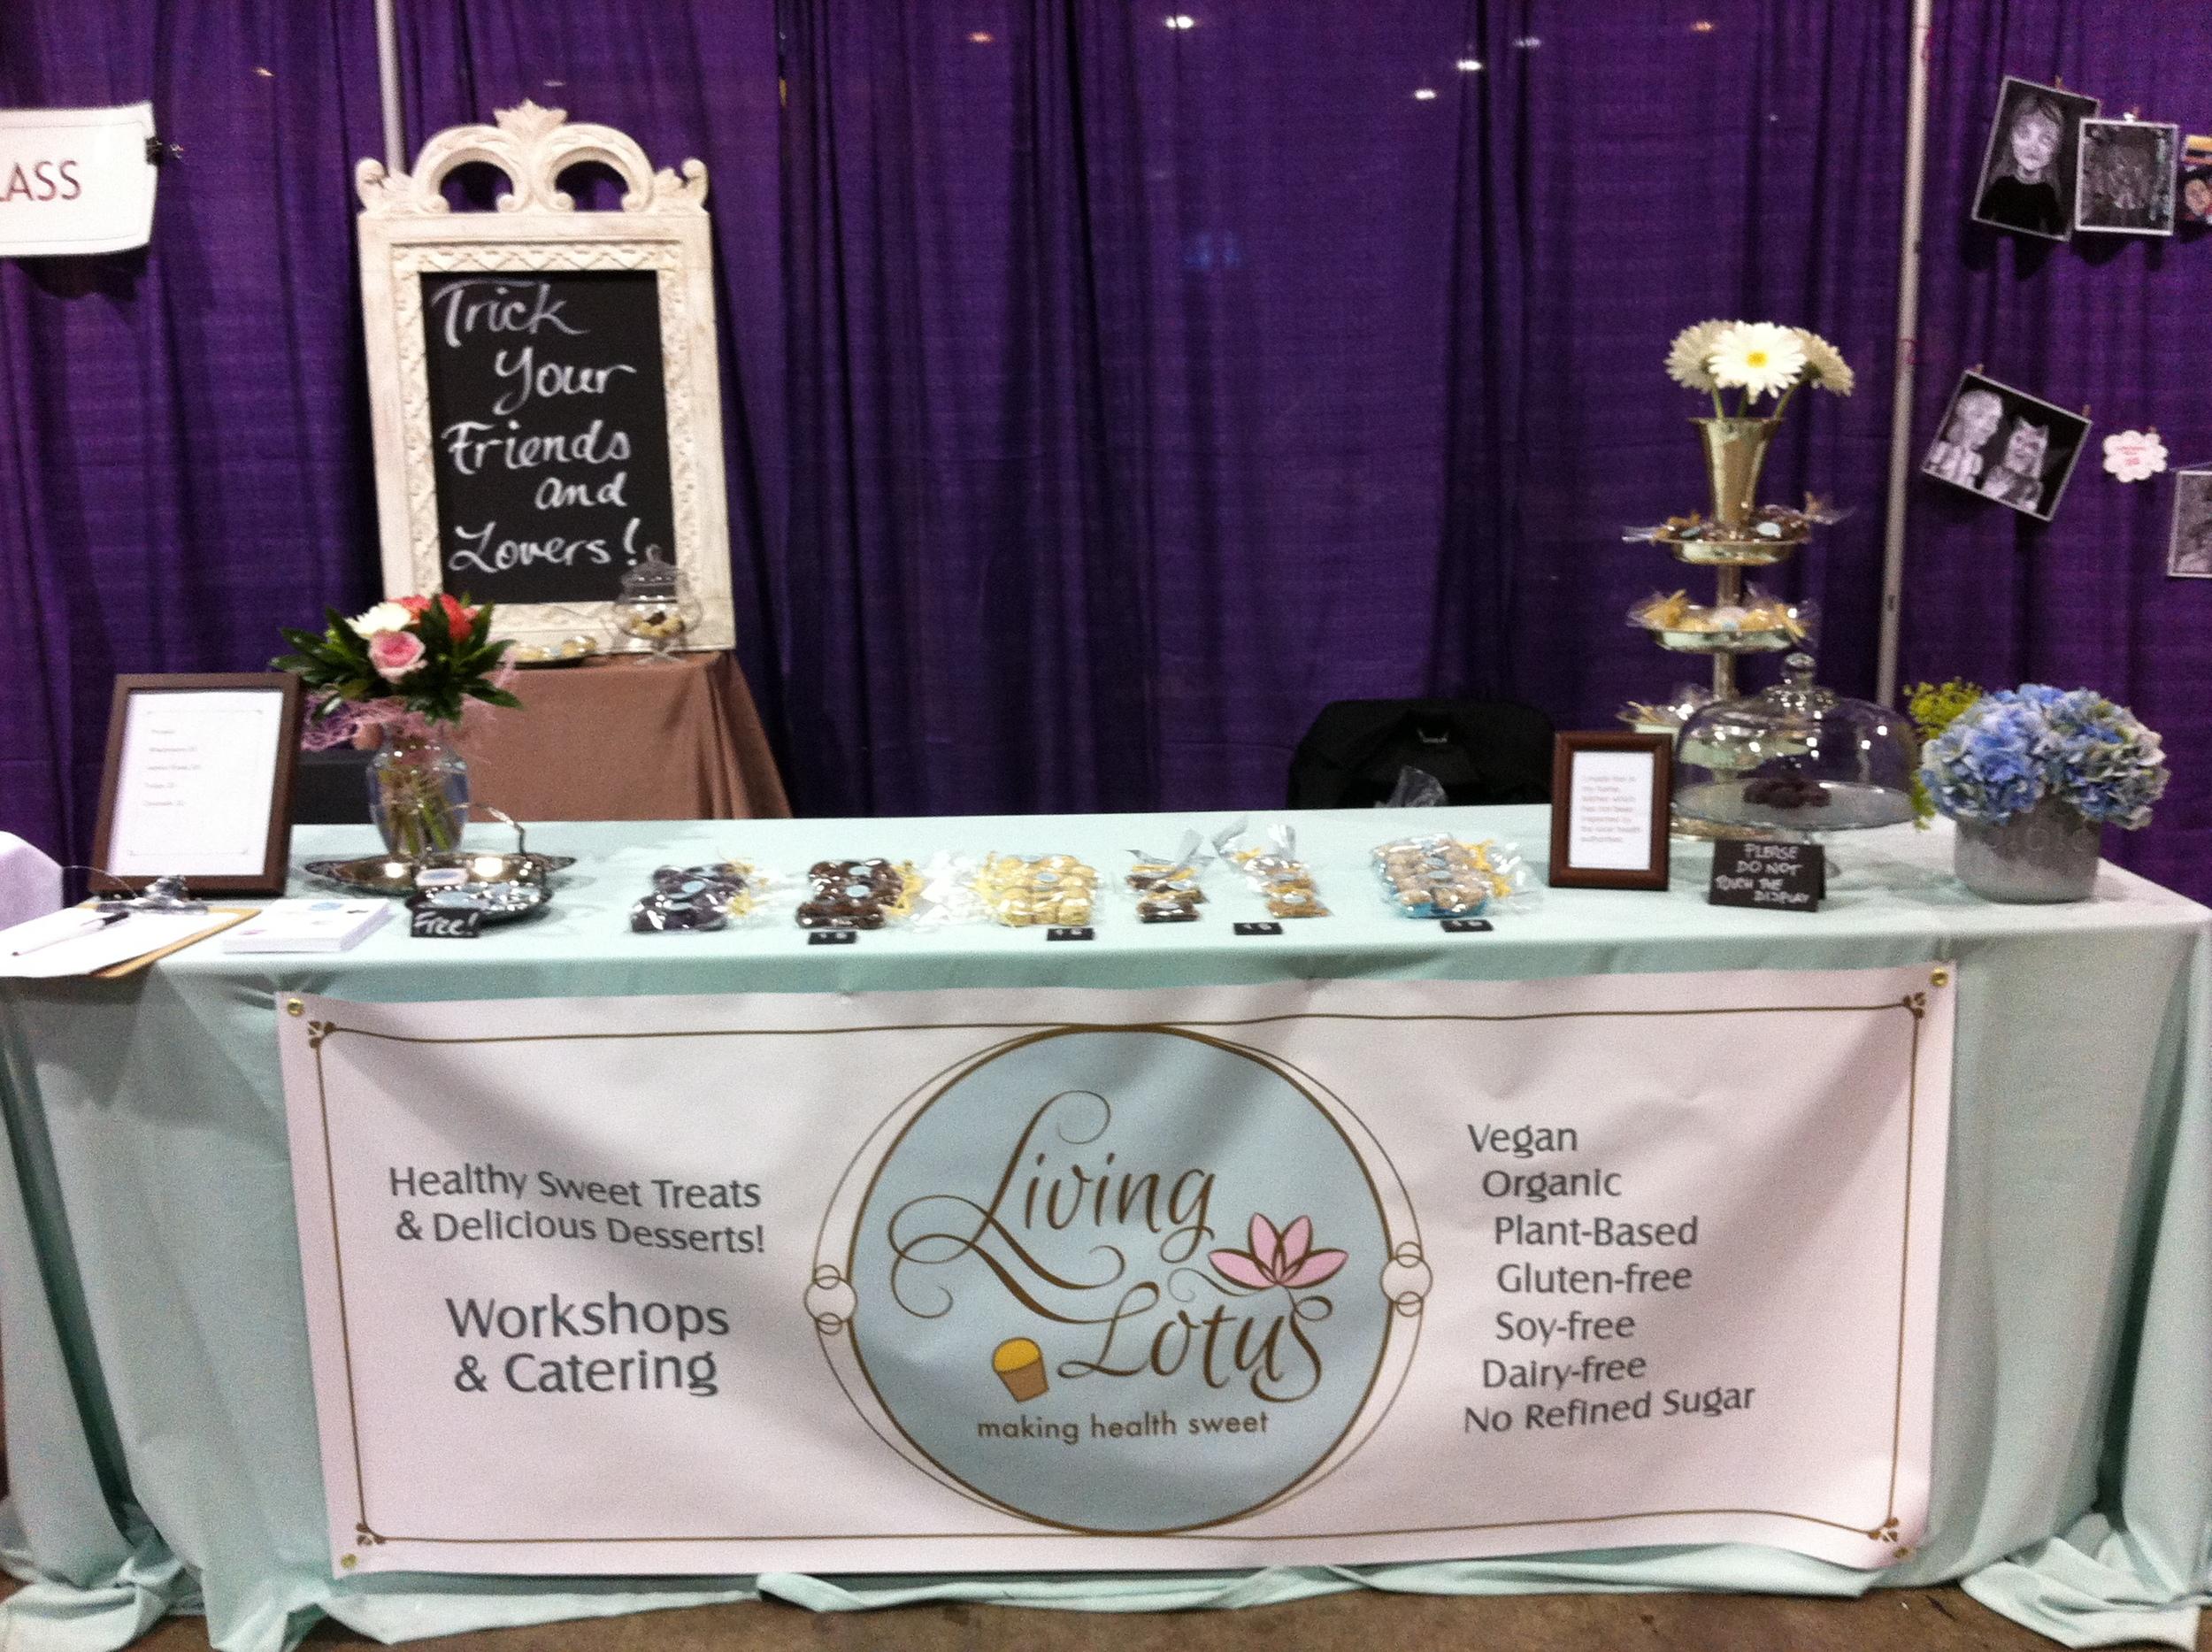 Living Lotus Food & Nutrition: Making Health Sweet!